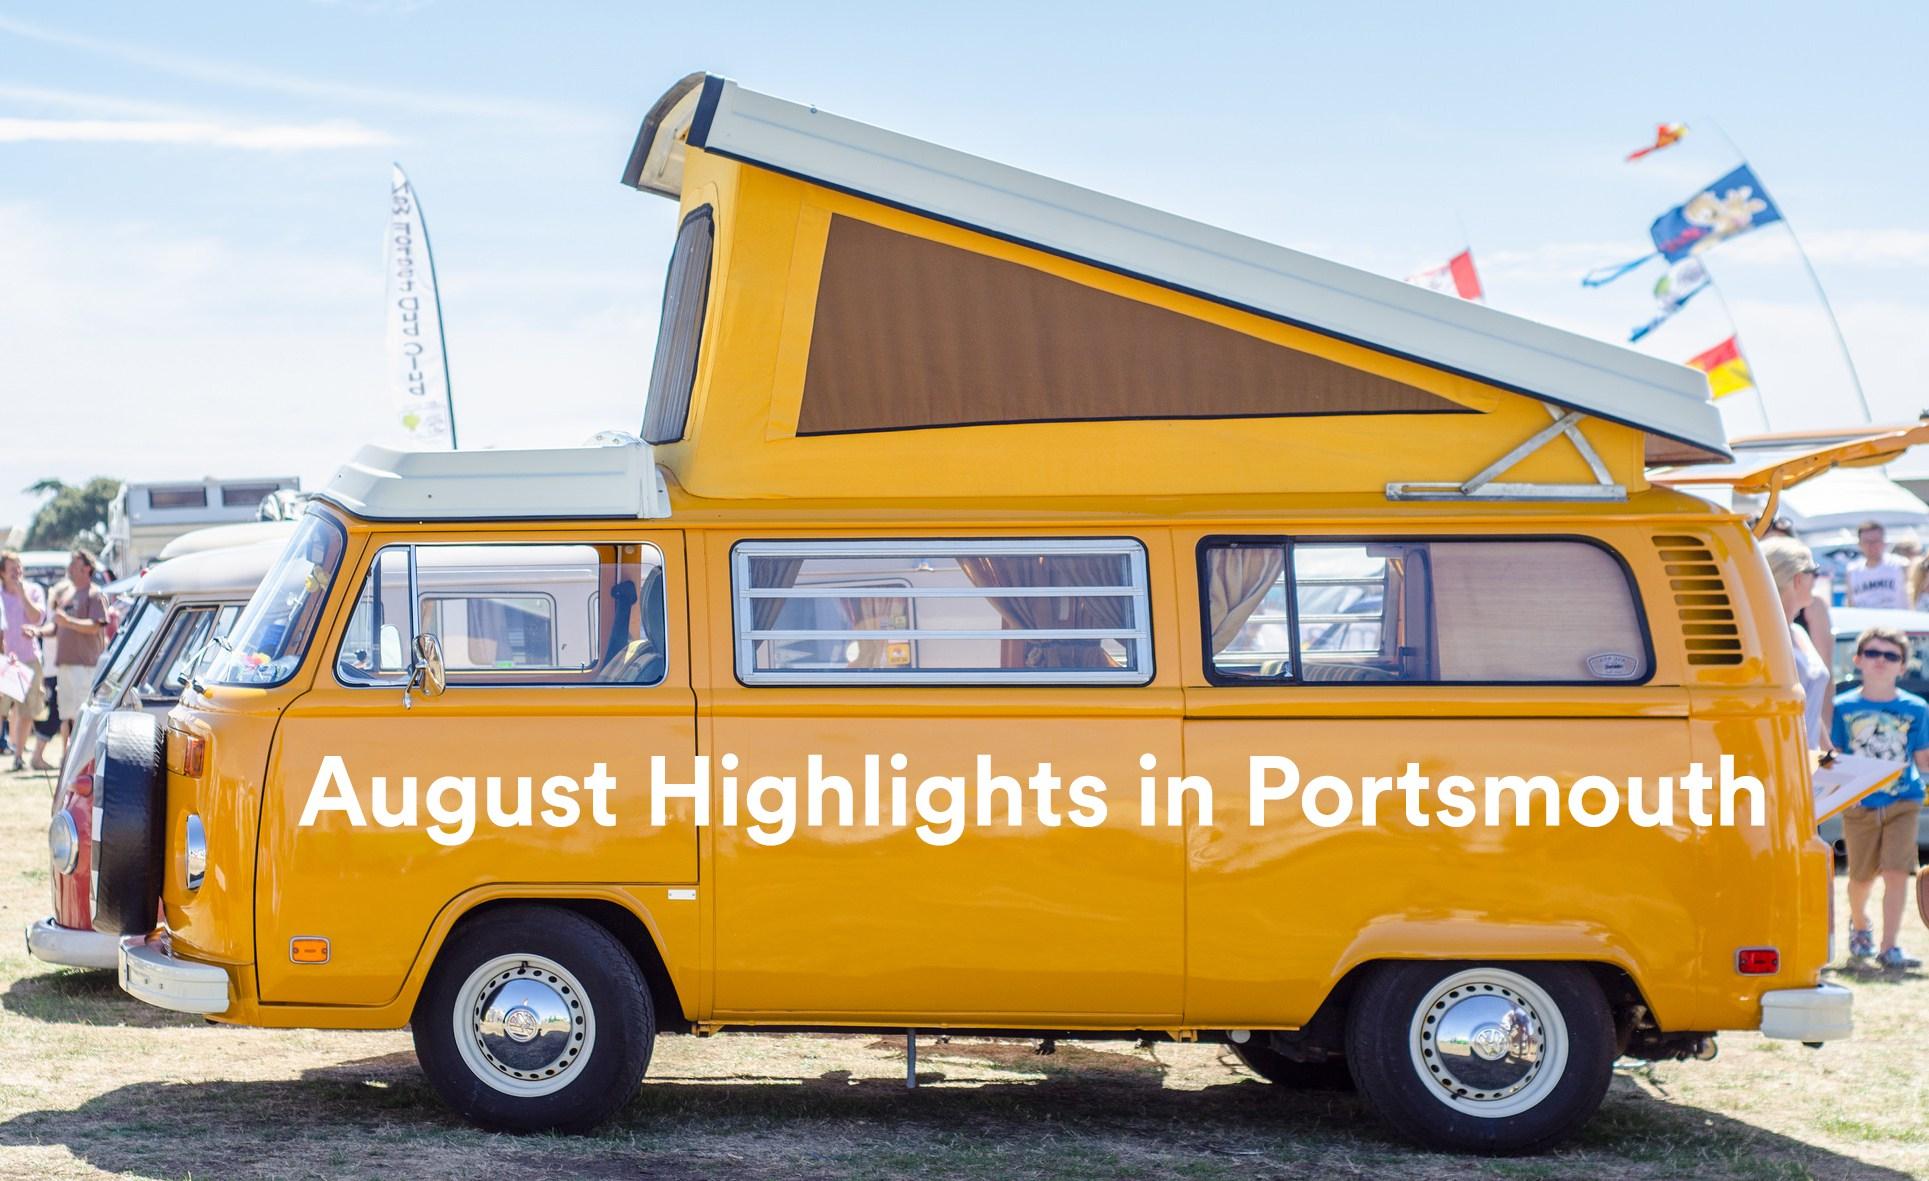 August-Highlights-in-Portsmouth.jpg